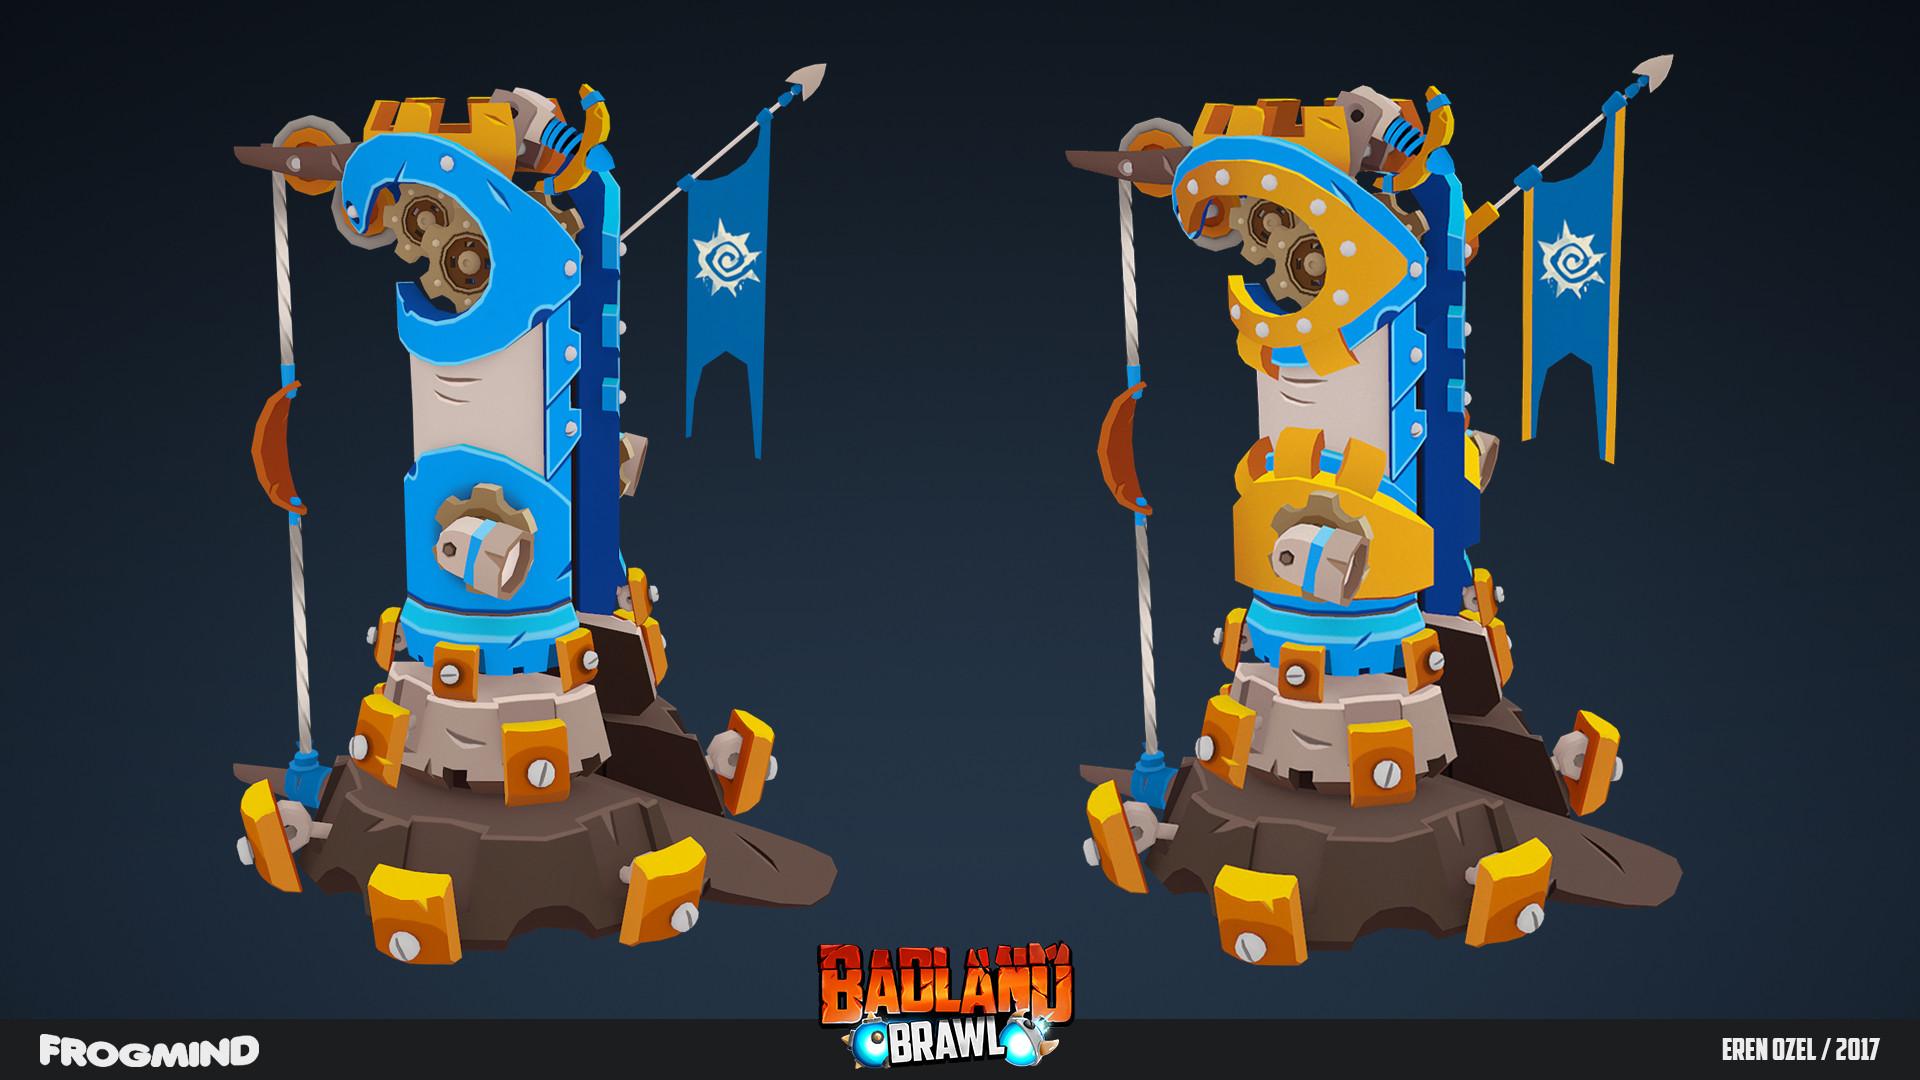 Eren ozel badlandbrawl tower 003